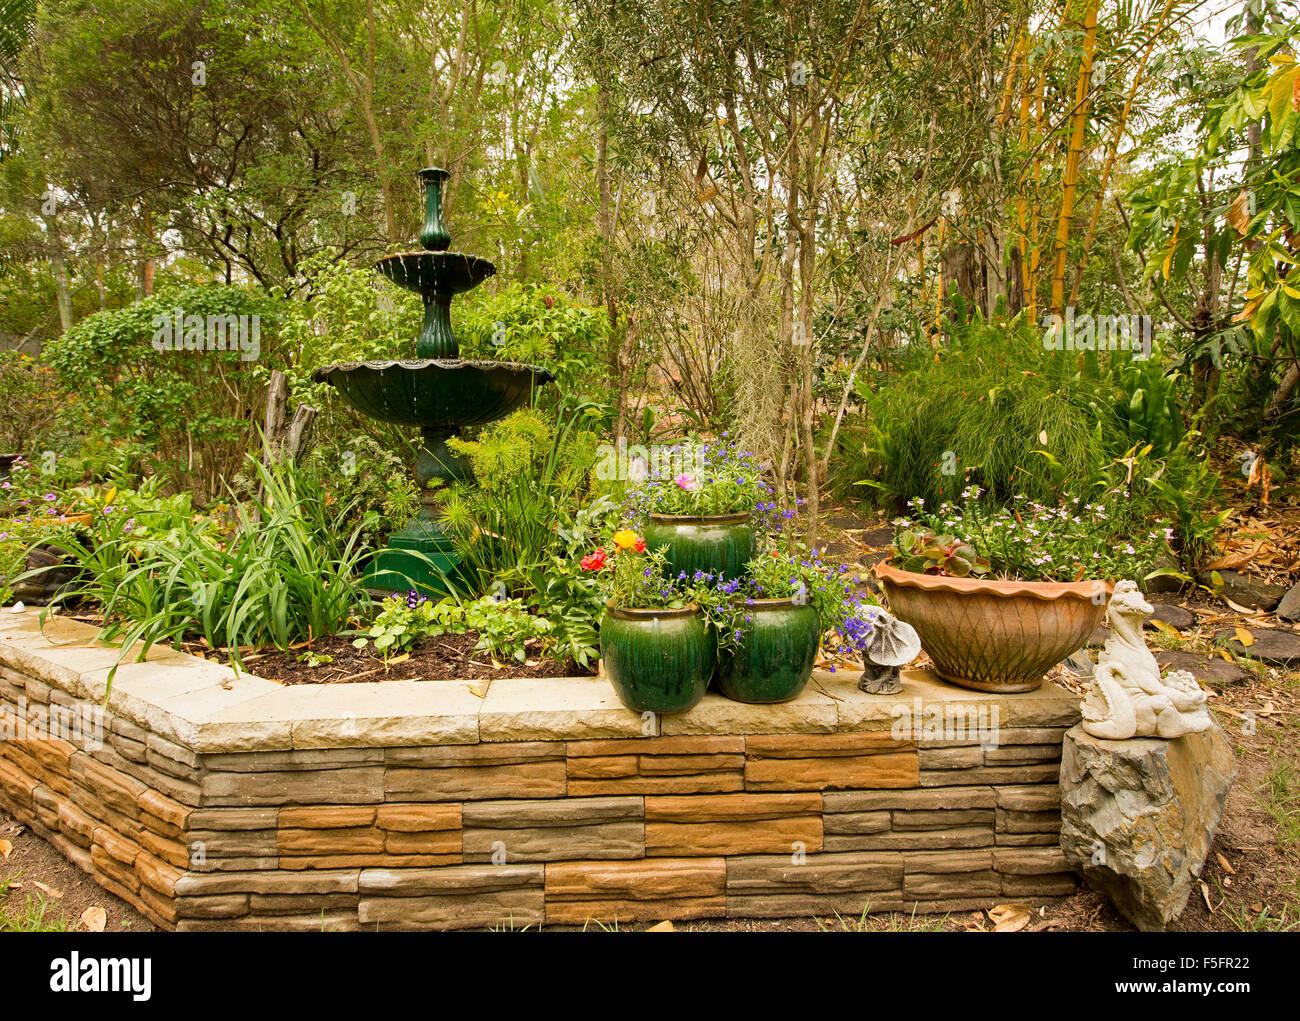 Fontana Giardino Pietra : Giardino decorativo caratteristica con un basso muro di pietra